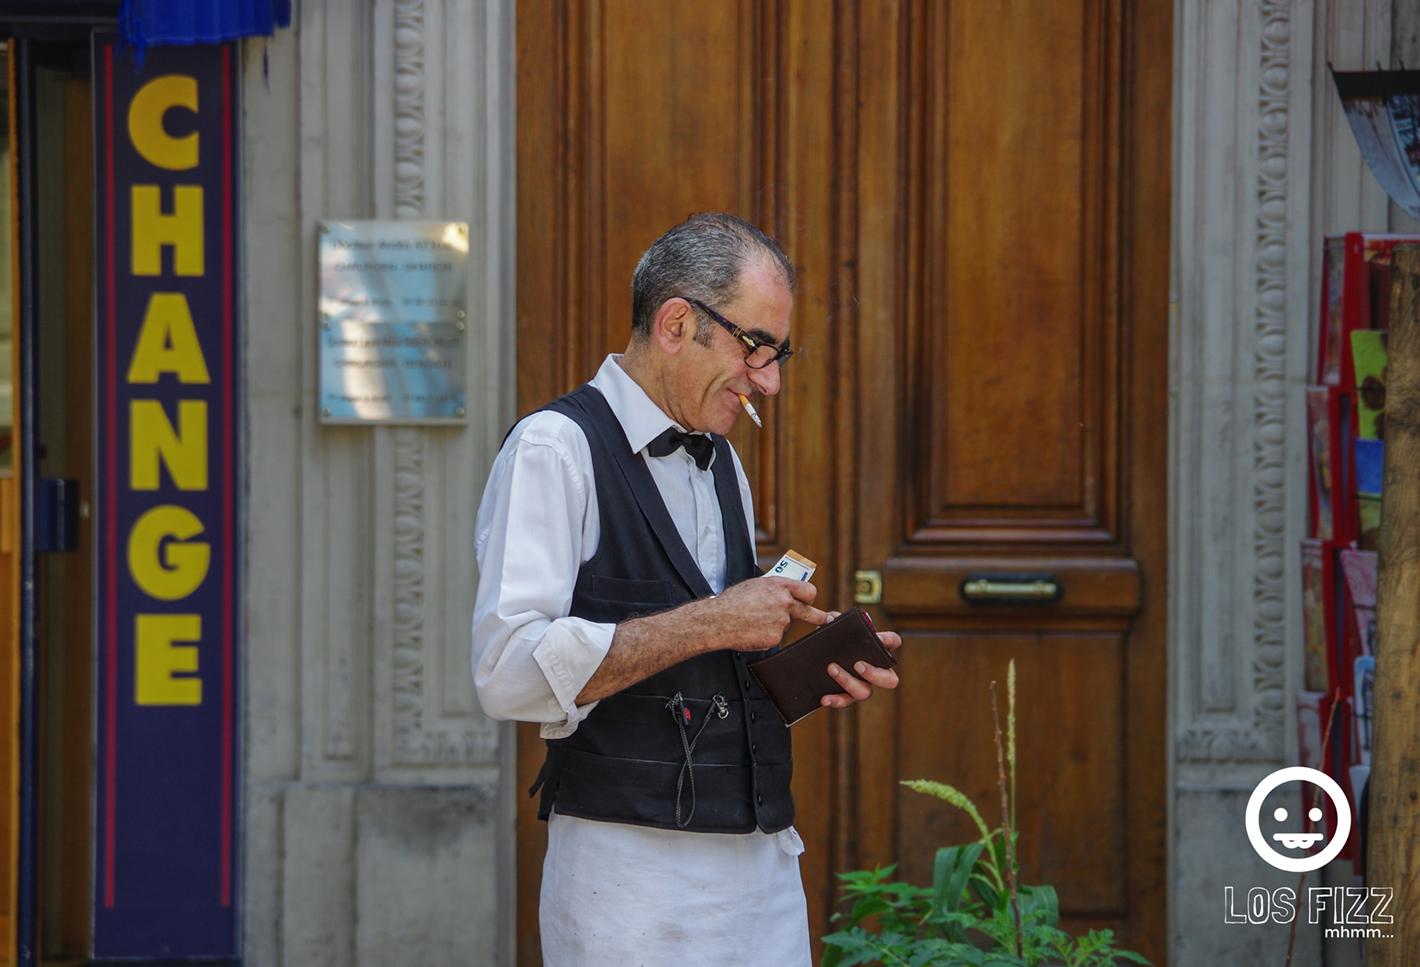 Waiter outside of Parisian restaurant near Notre Dame Photo By LosFizz.